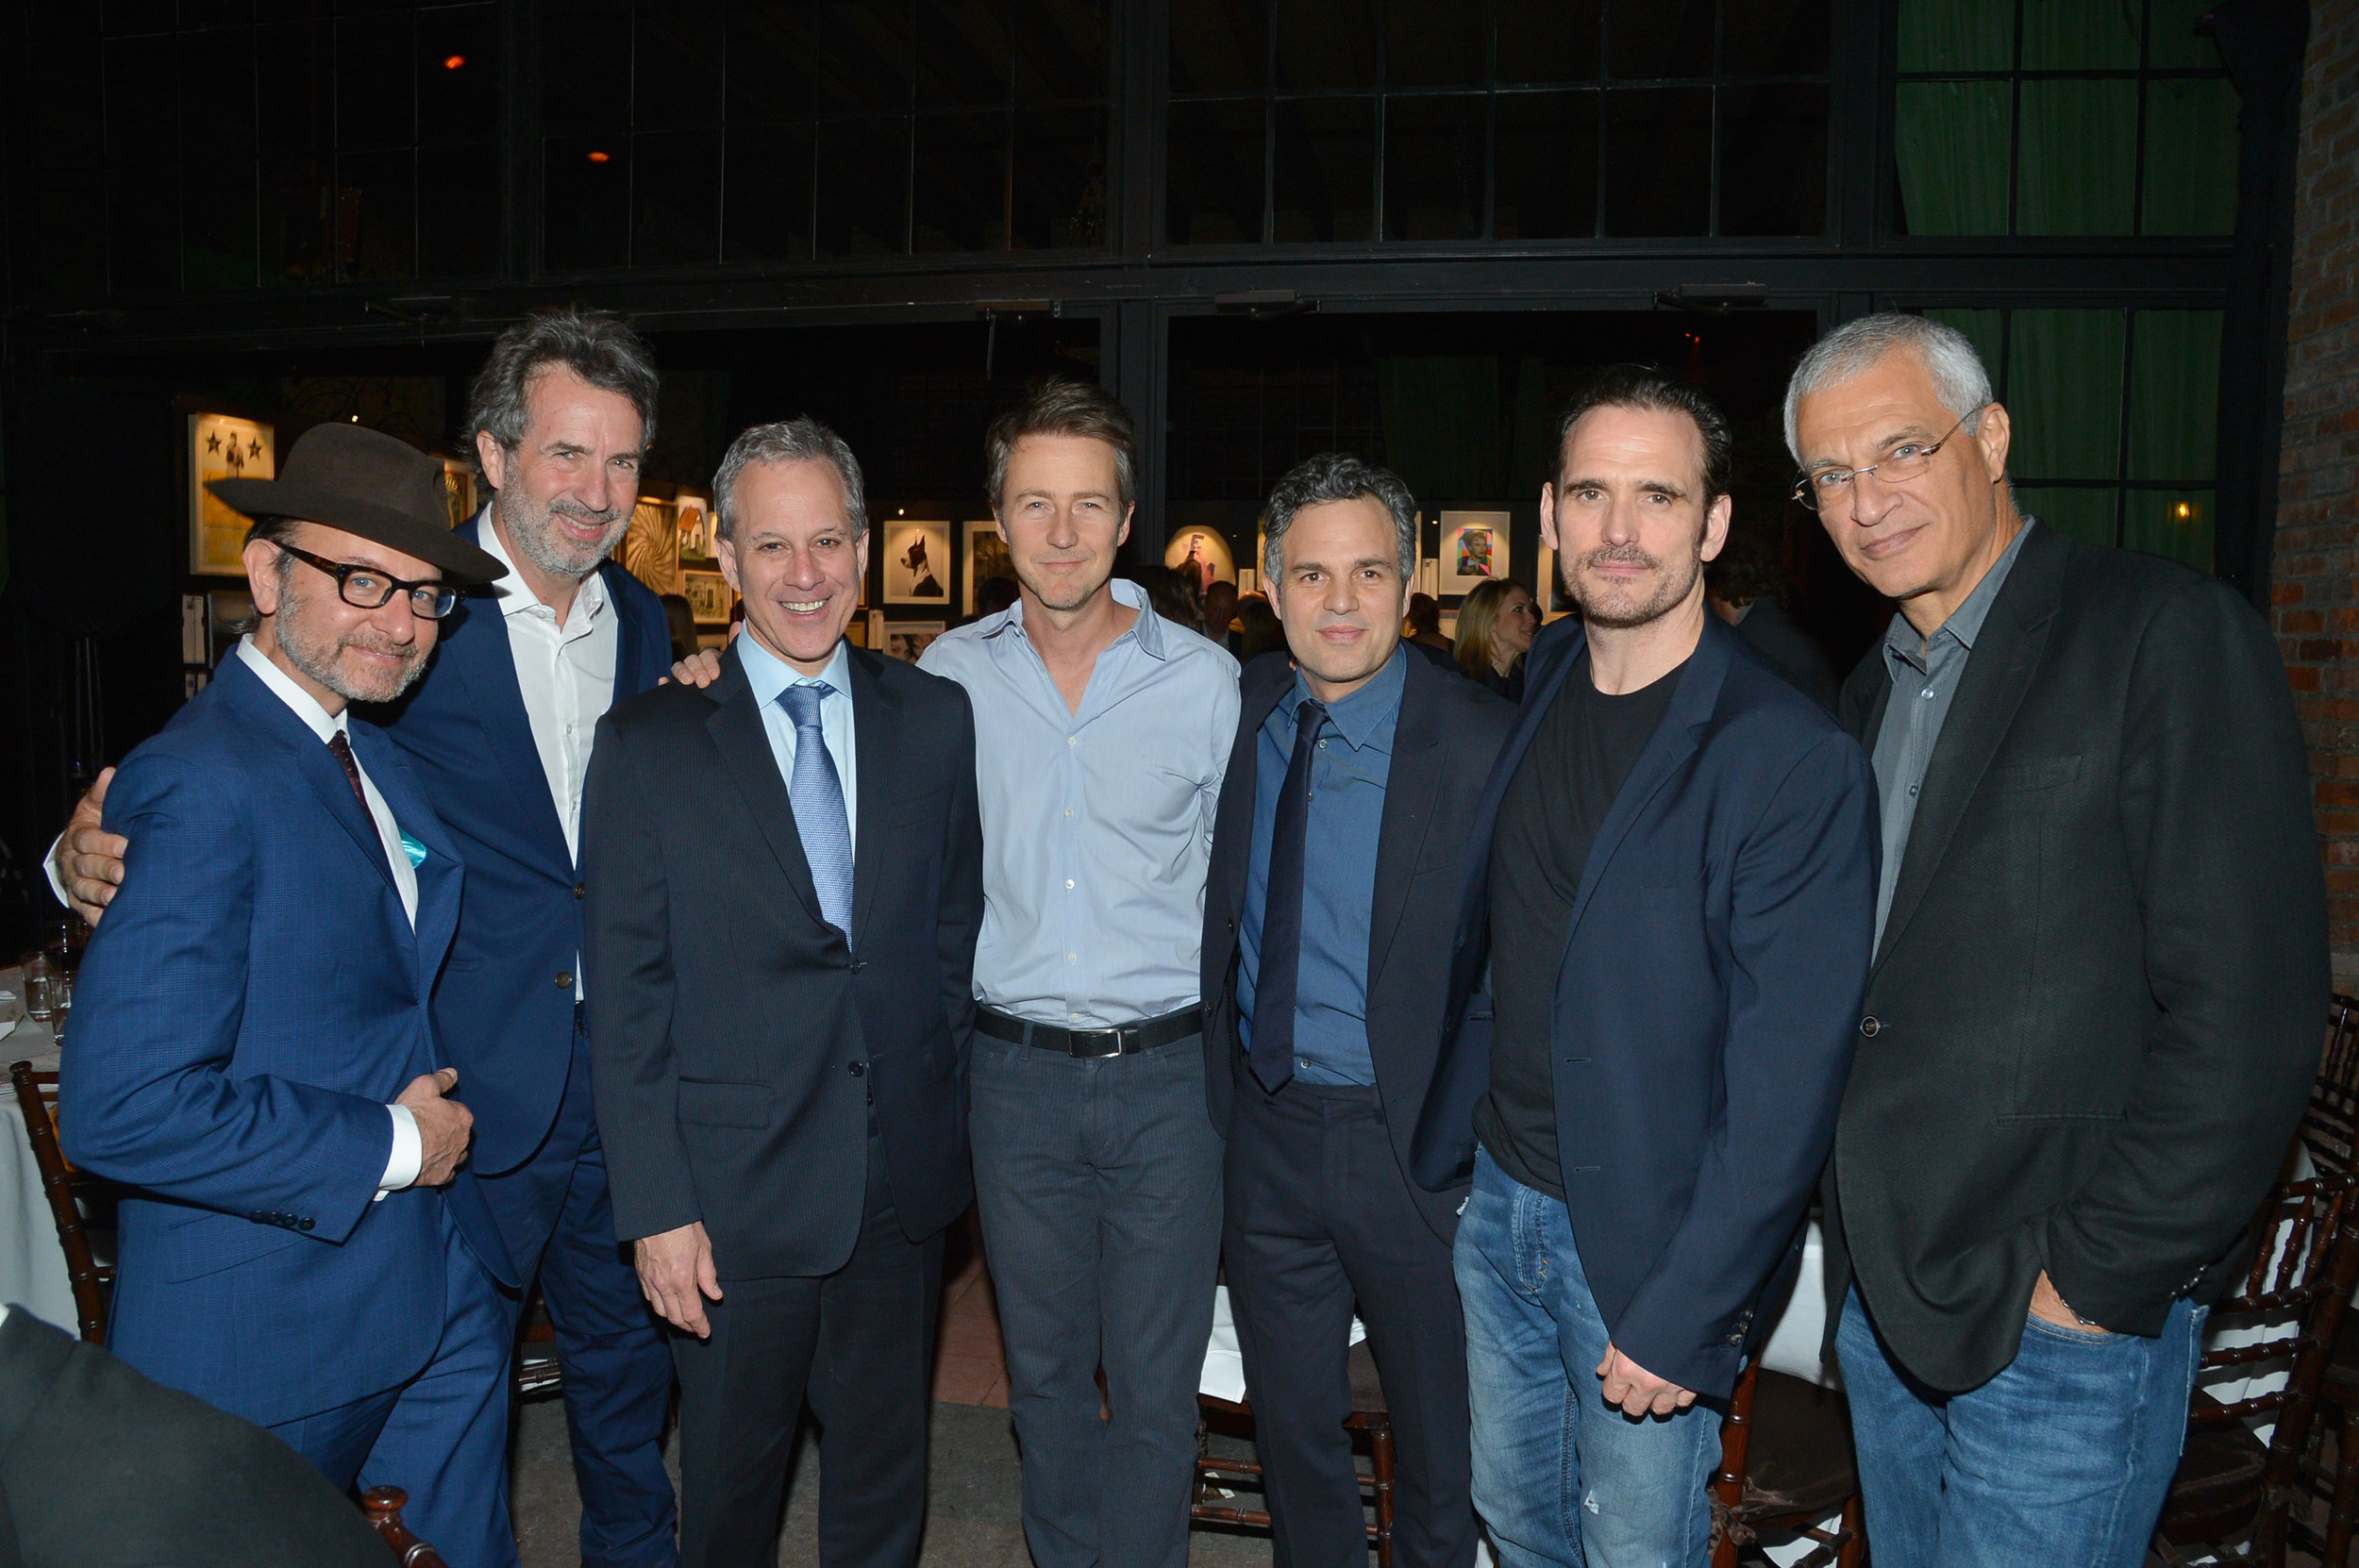 Fisher Stevens, Eric Goode, Eric Schneiderman, Edward Norton, Mark Ruffalo, Matt Dillon, and Louie Psihoyos